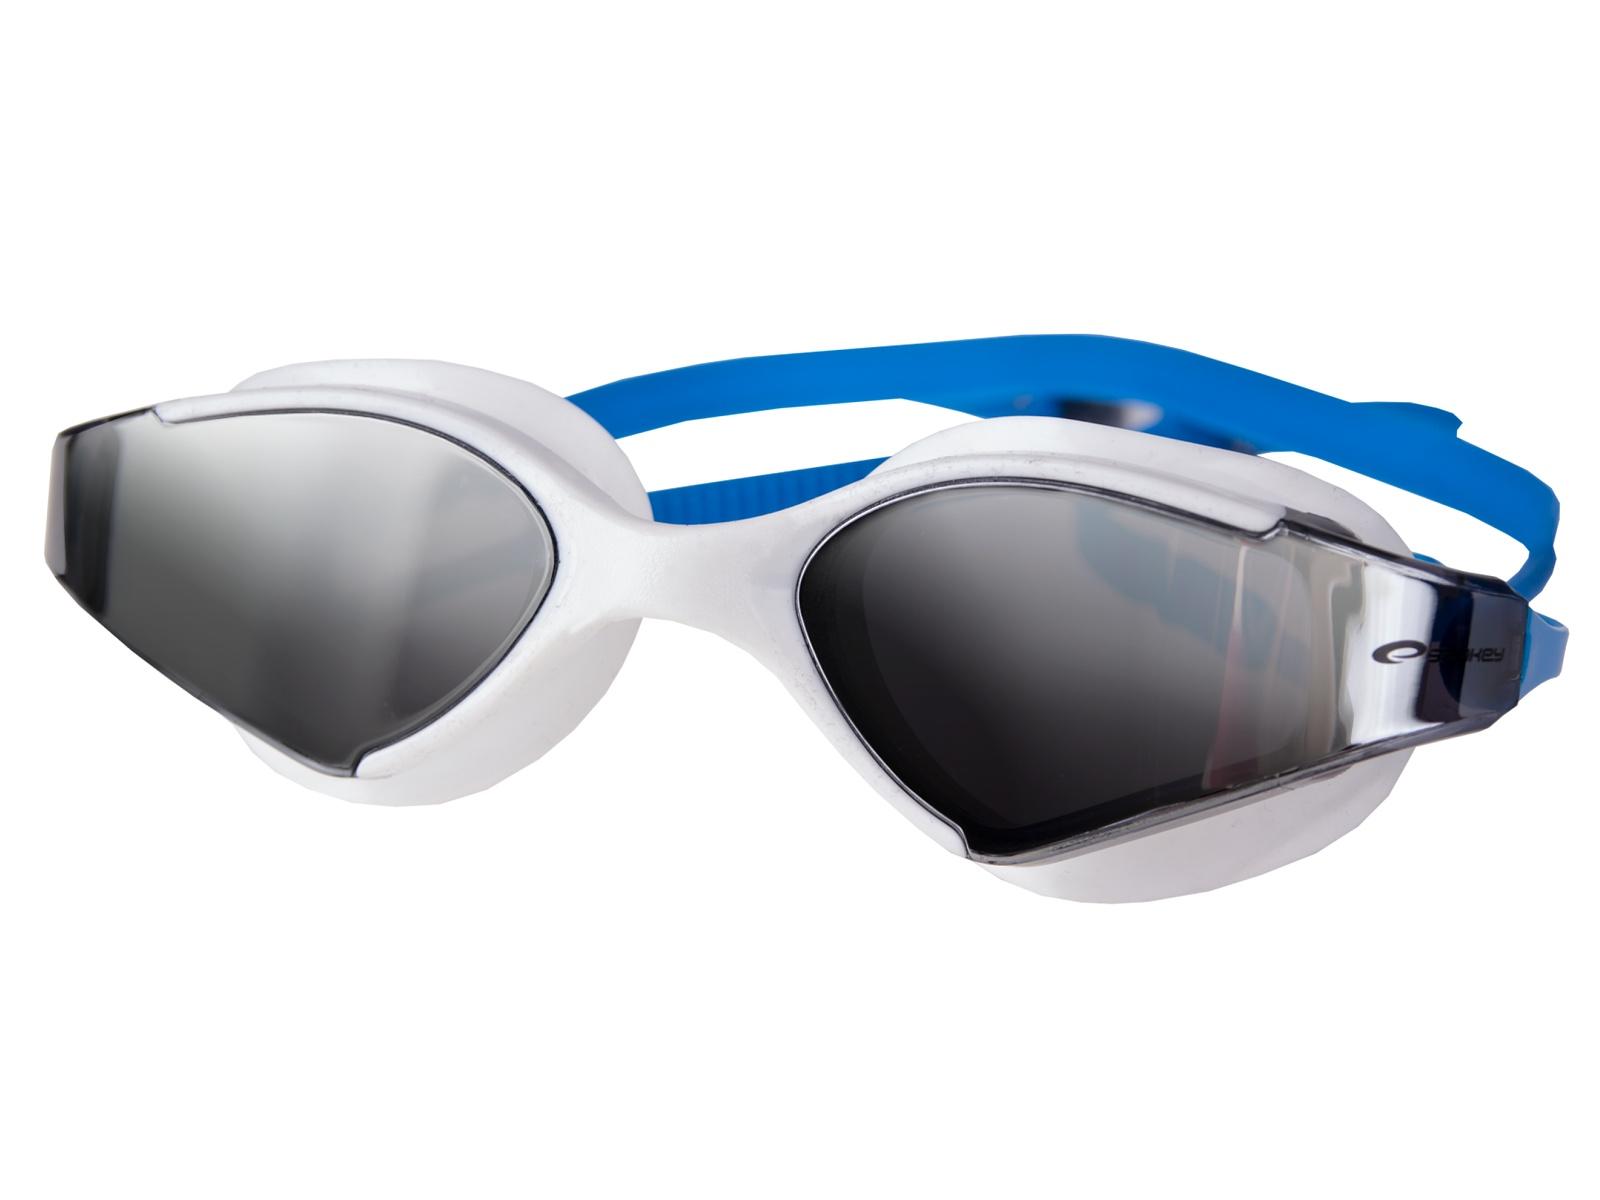 Plavecké brýle SPOKEY Tora - bílé